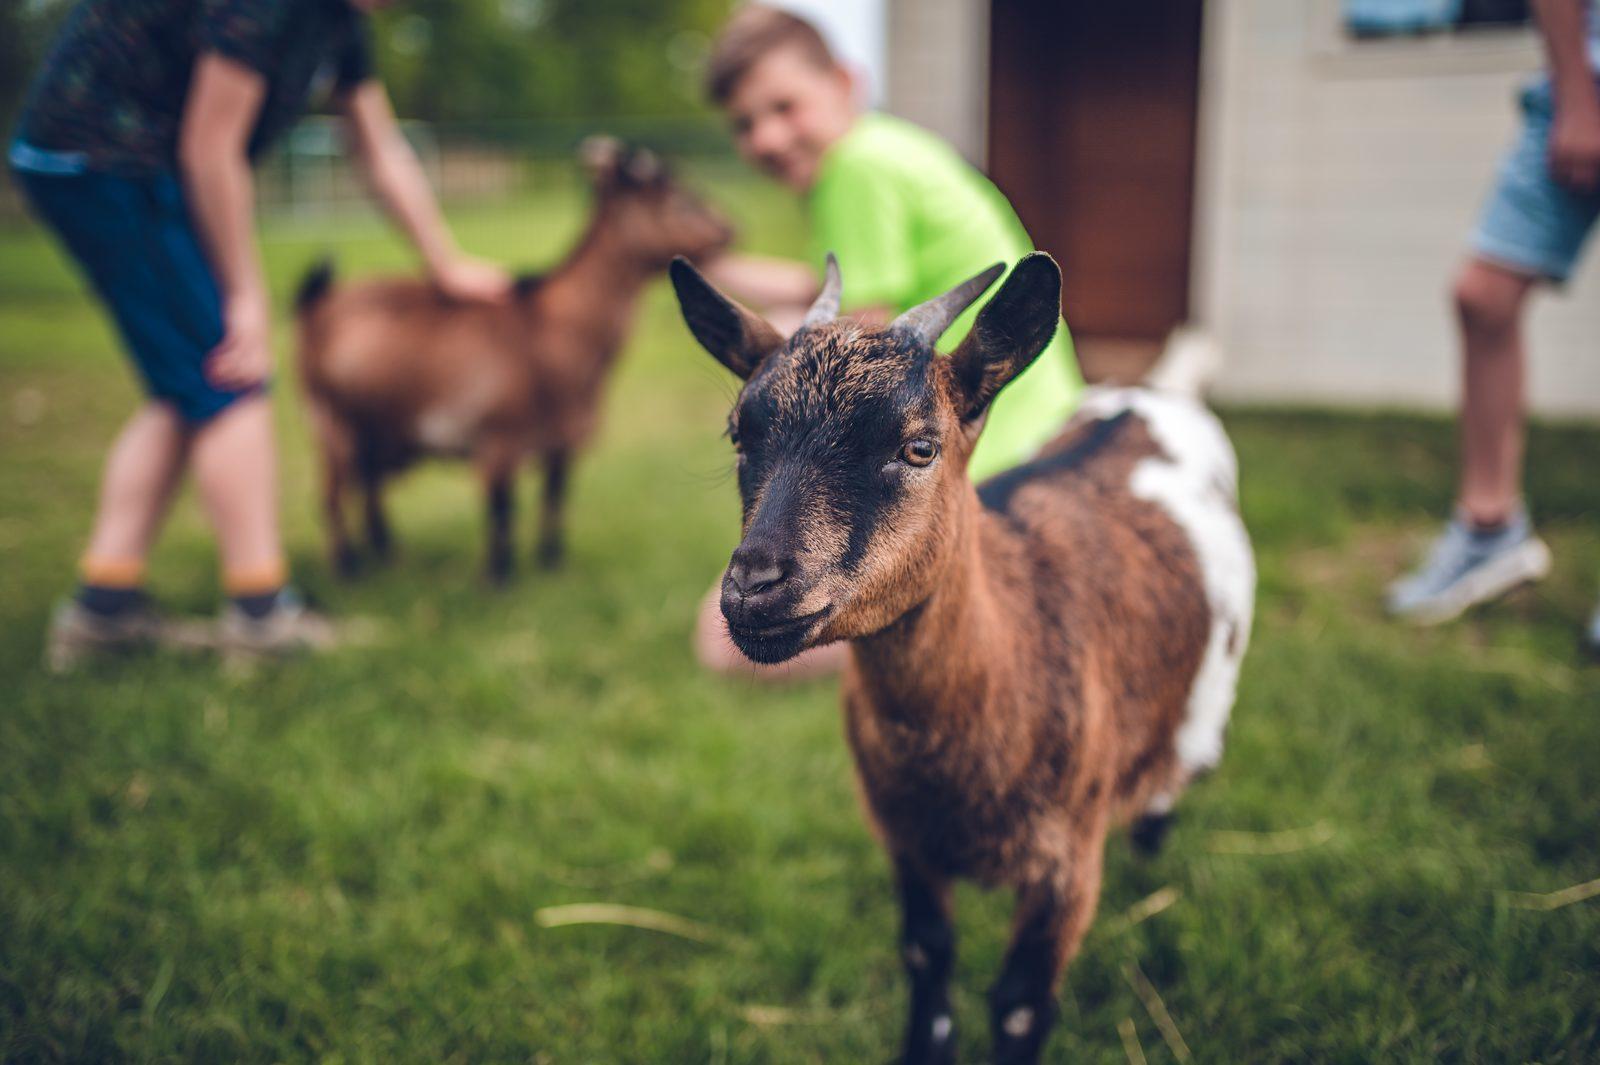 Animal pasture